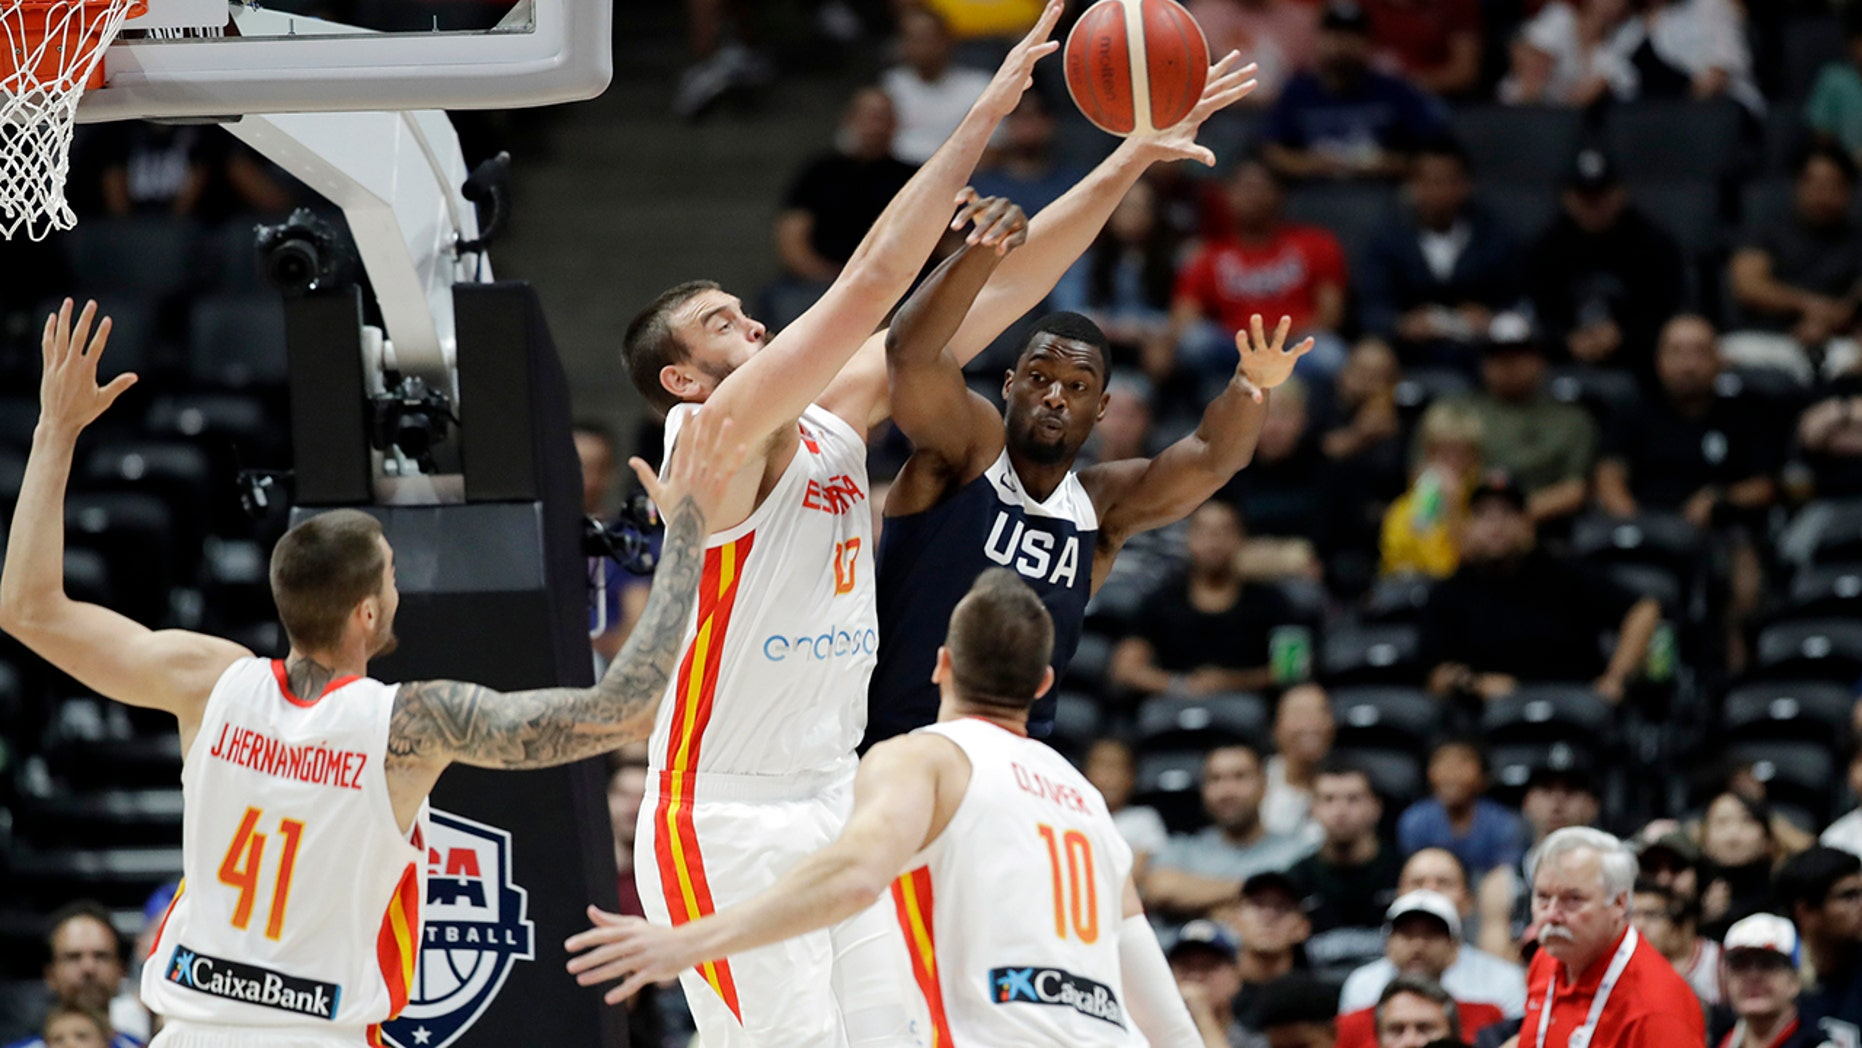 Westlake Legal Group NBA-Marc-Gasol At 34, Raptors' Marc Gasol will carry Spain's World Cup hope fox-news/sports/nba/toronto-raptors fox-news/sports/nba fnc/sports fnc Associated Press article 12bf8310-1af3-5b98-97a5-c2b2c6a37acf